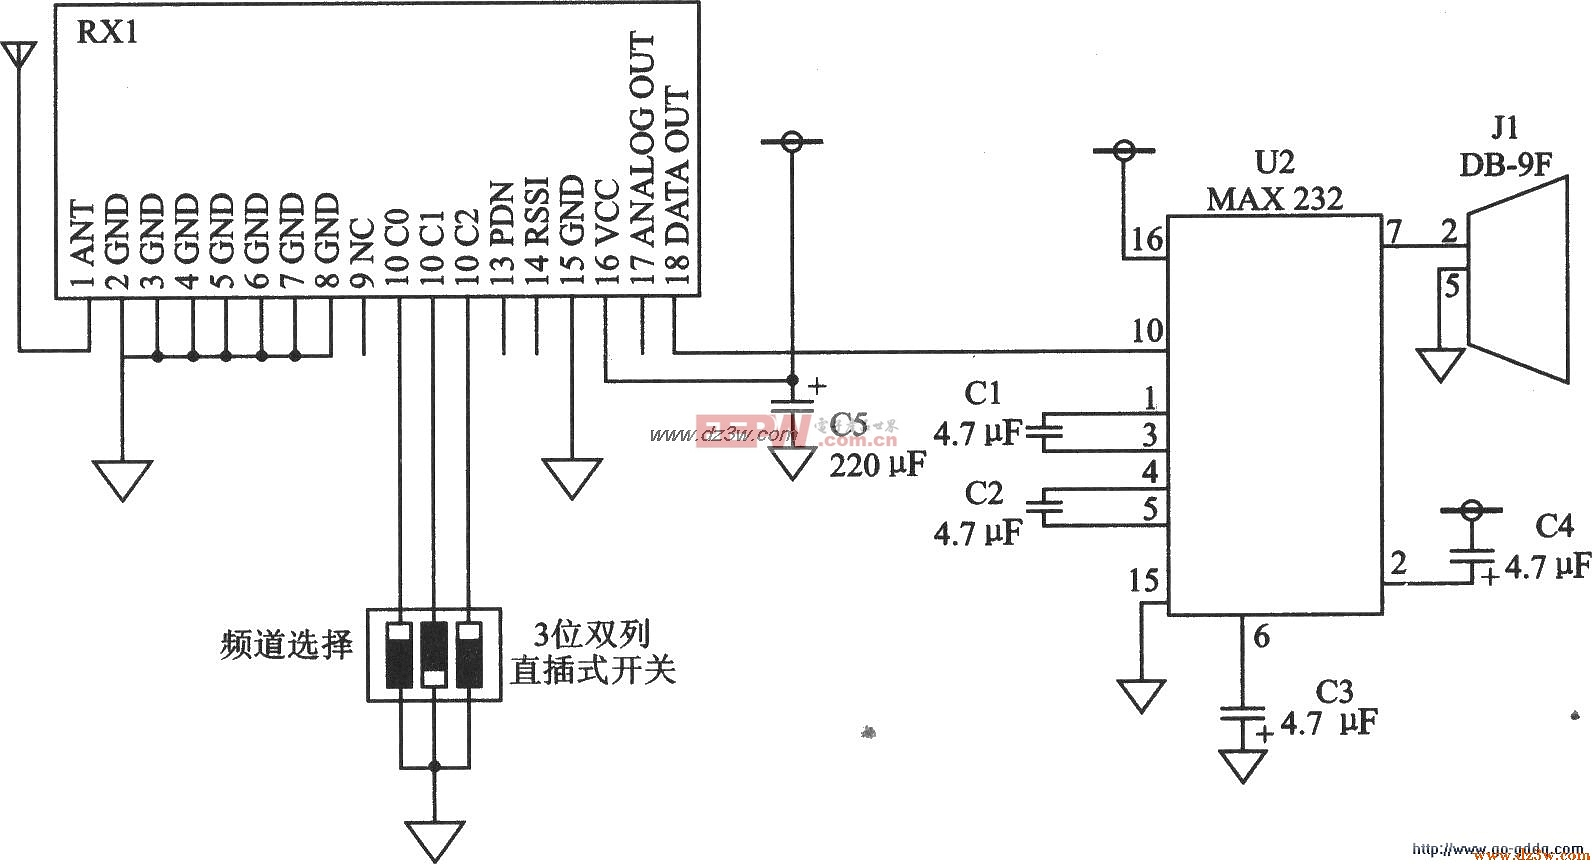 FM/FSK接收器模块RXM-900-HP-II应用电路图